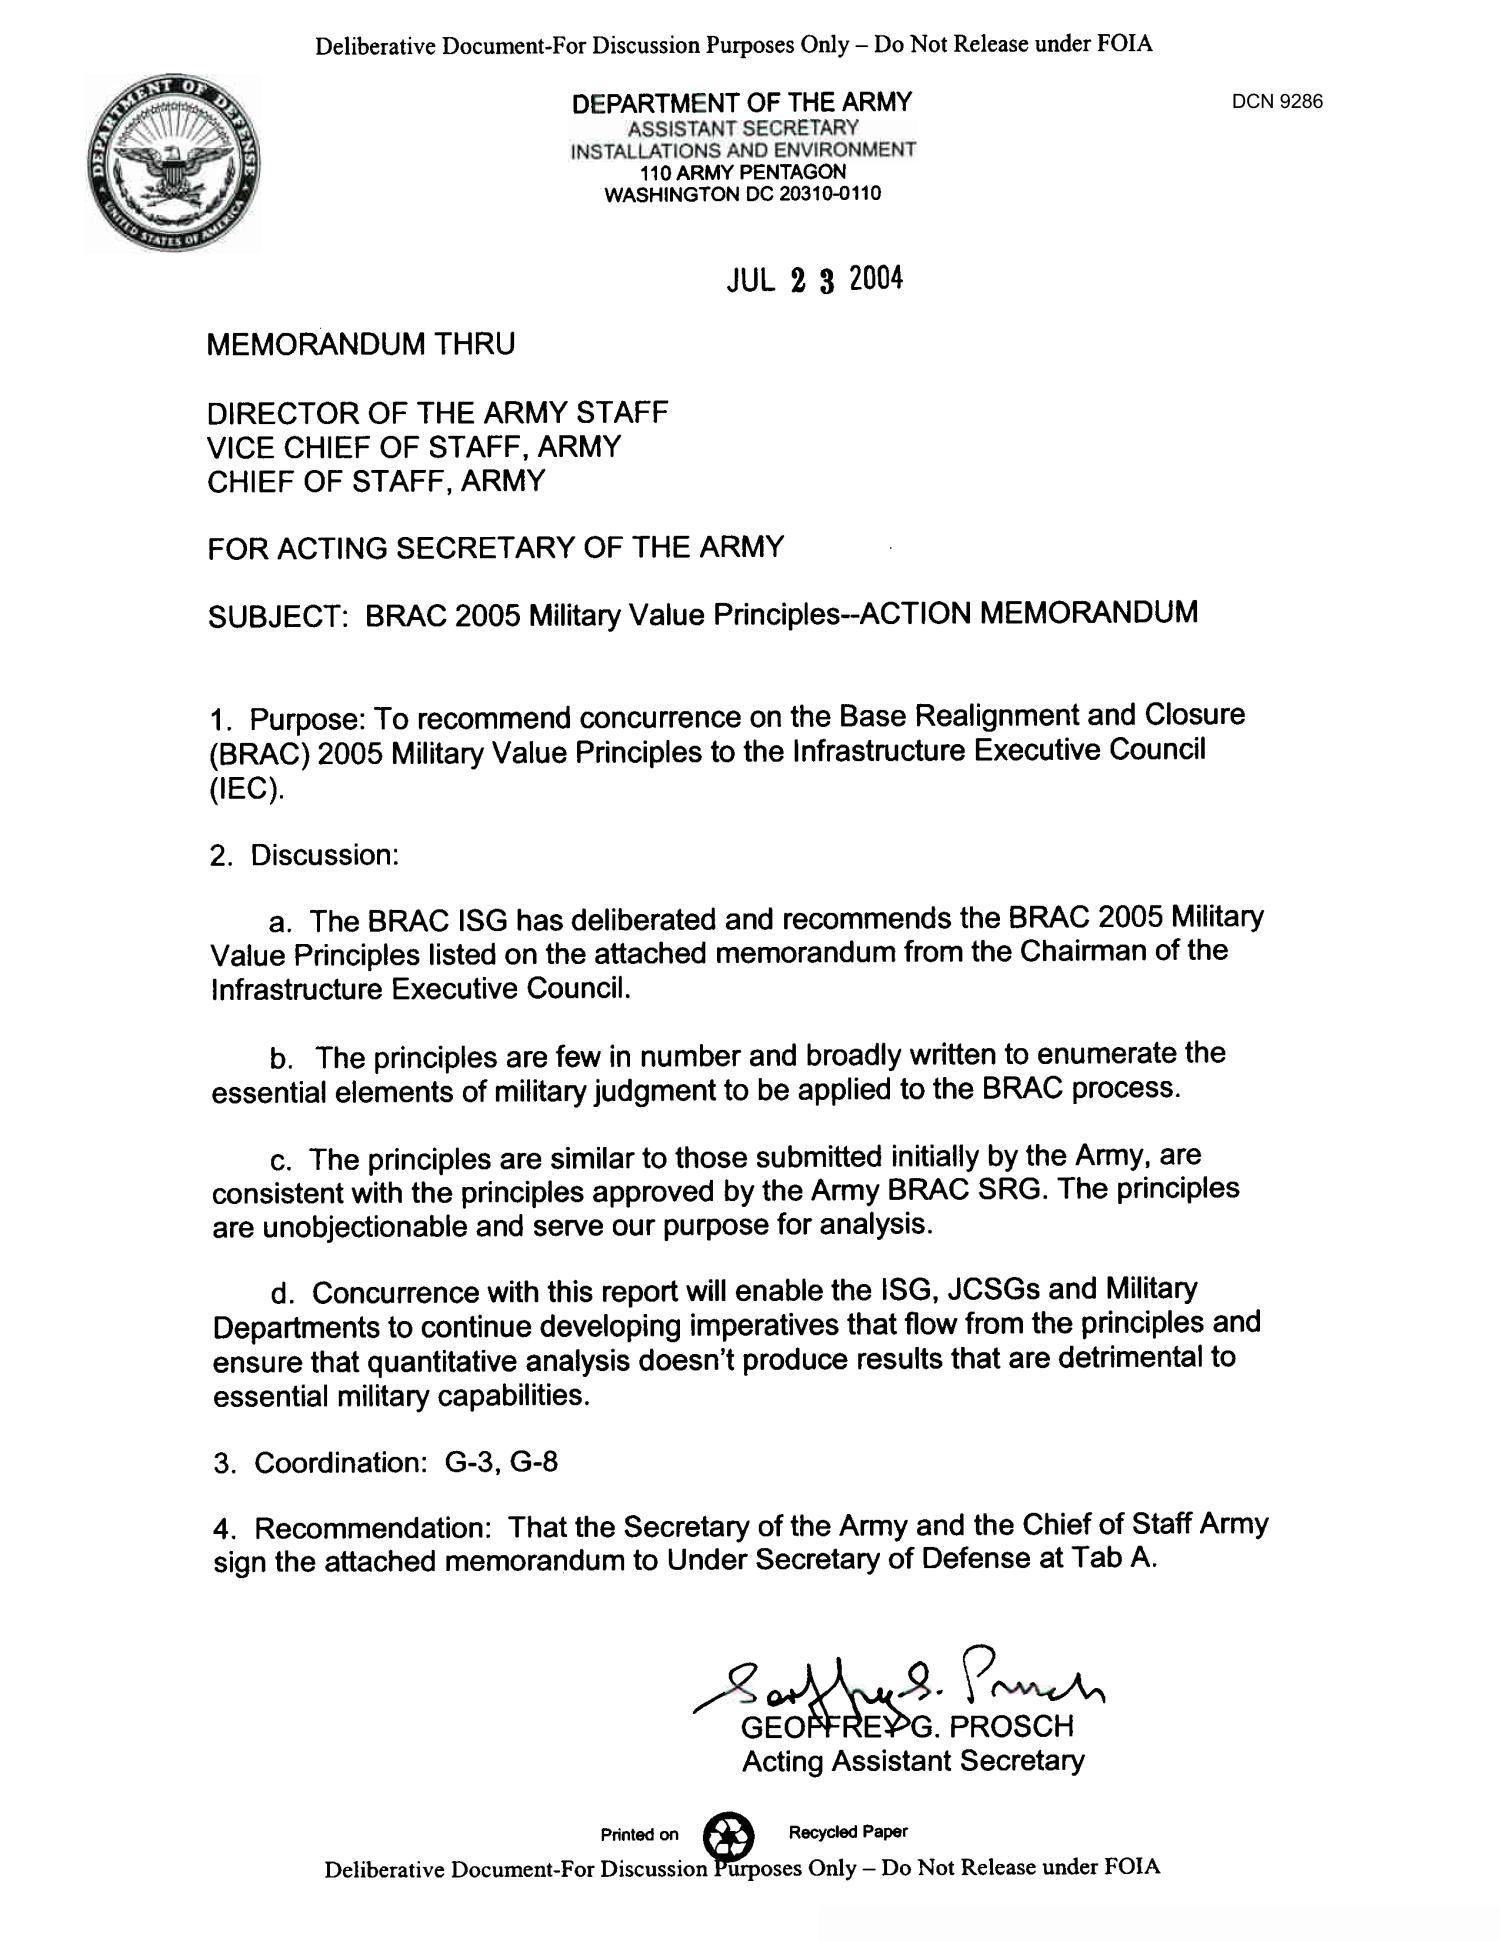 Memorandum For The Acting Secretary Of The Army BRAC 2005